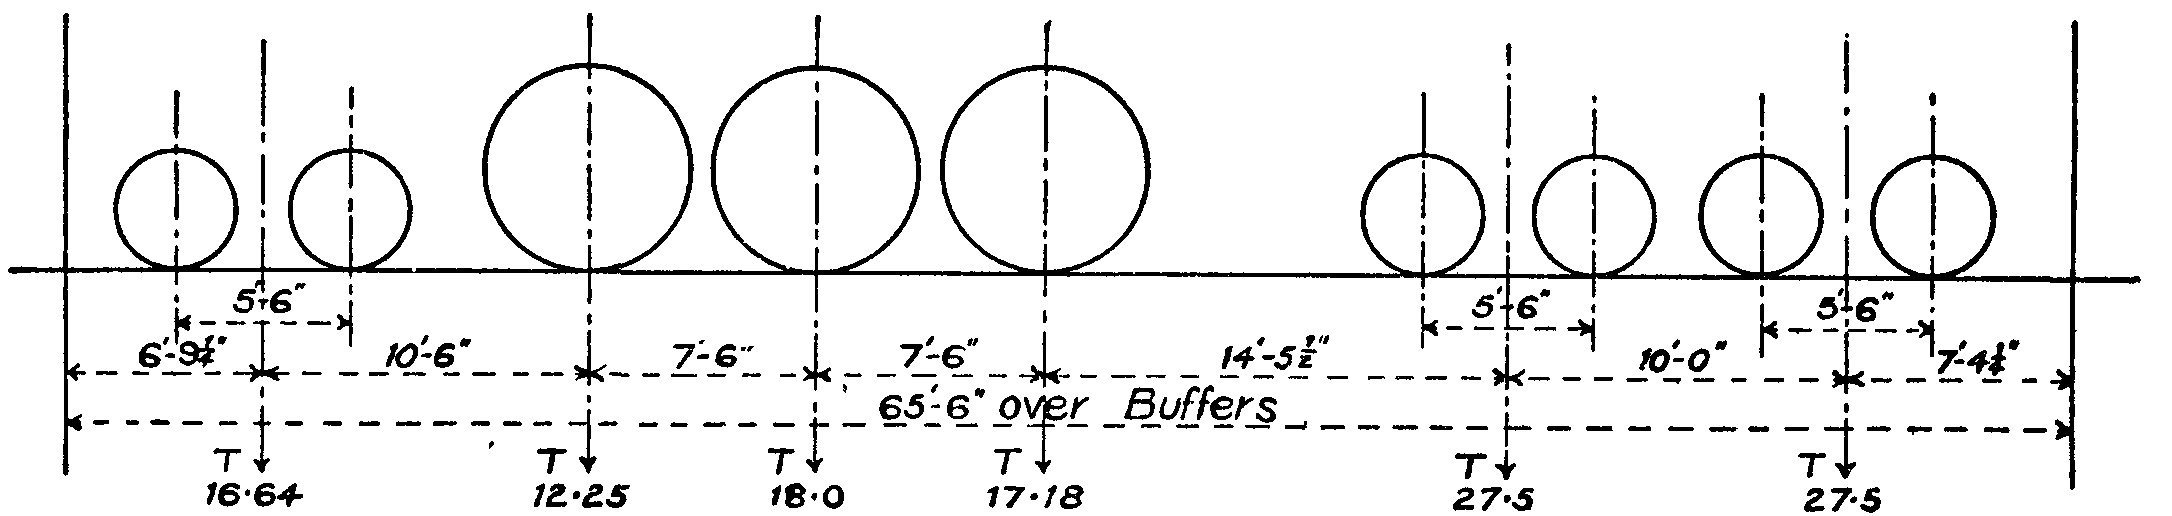 Fileblock Diagram Of Reflectional Radio Receiverpng Wikimedia